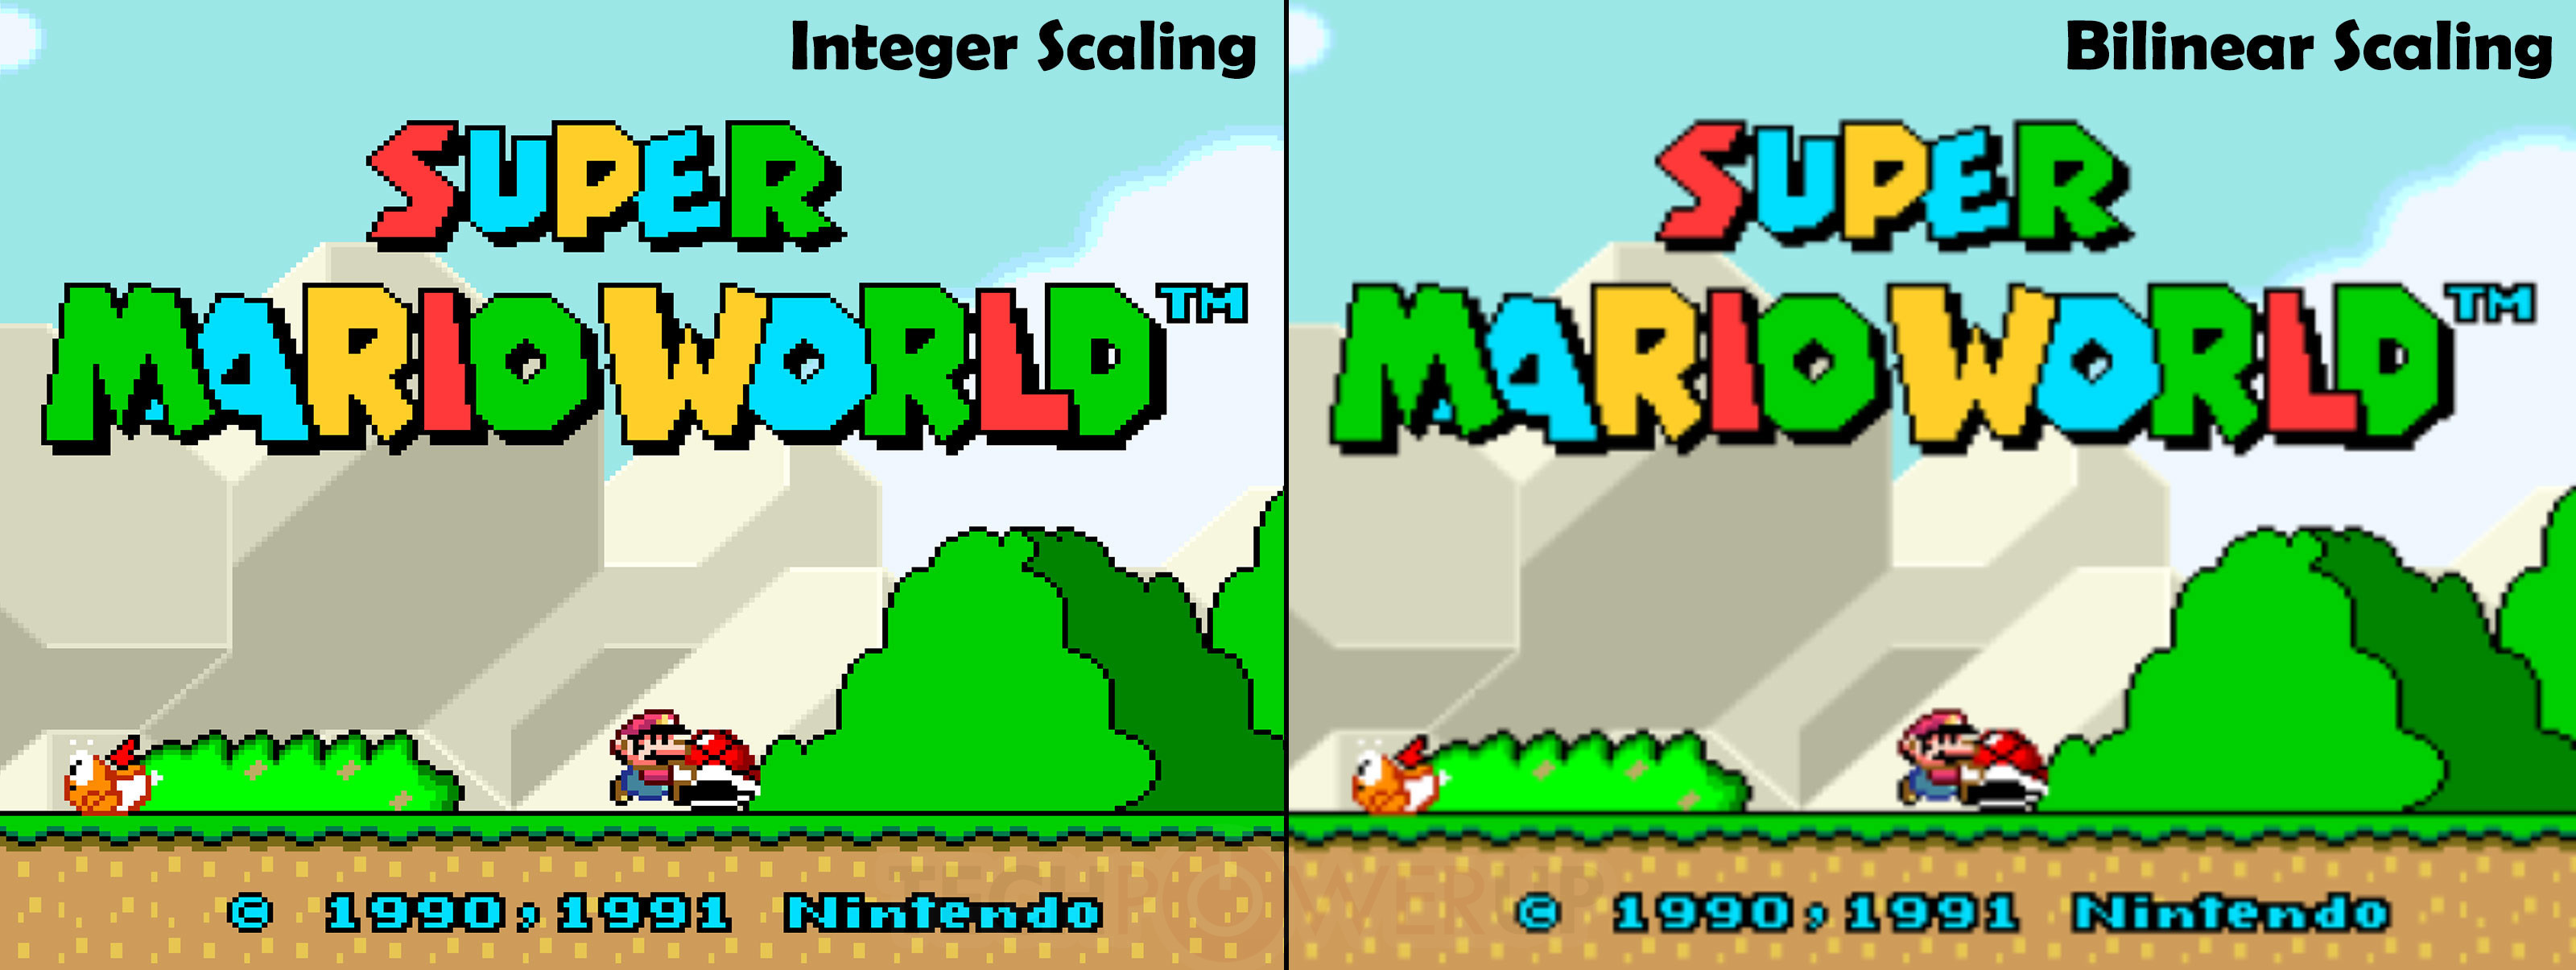 integer_scaling